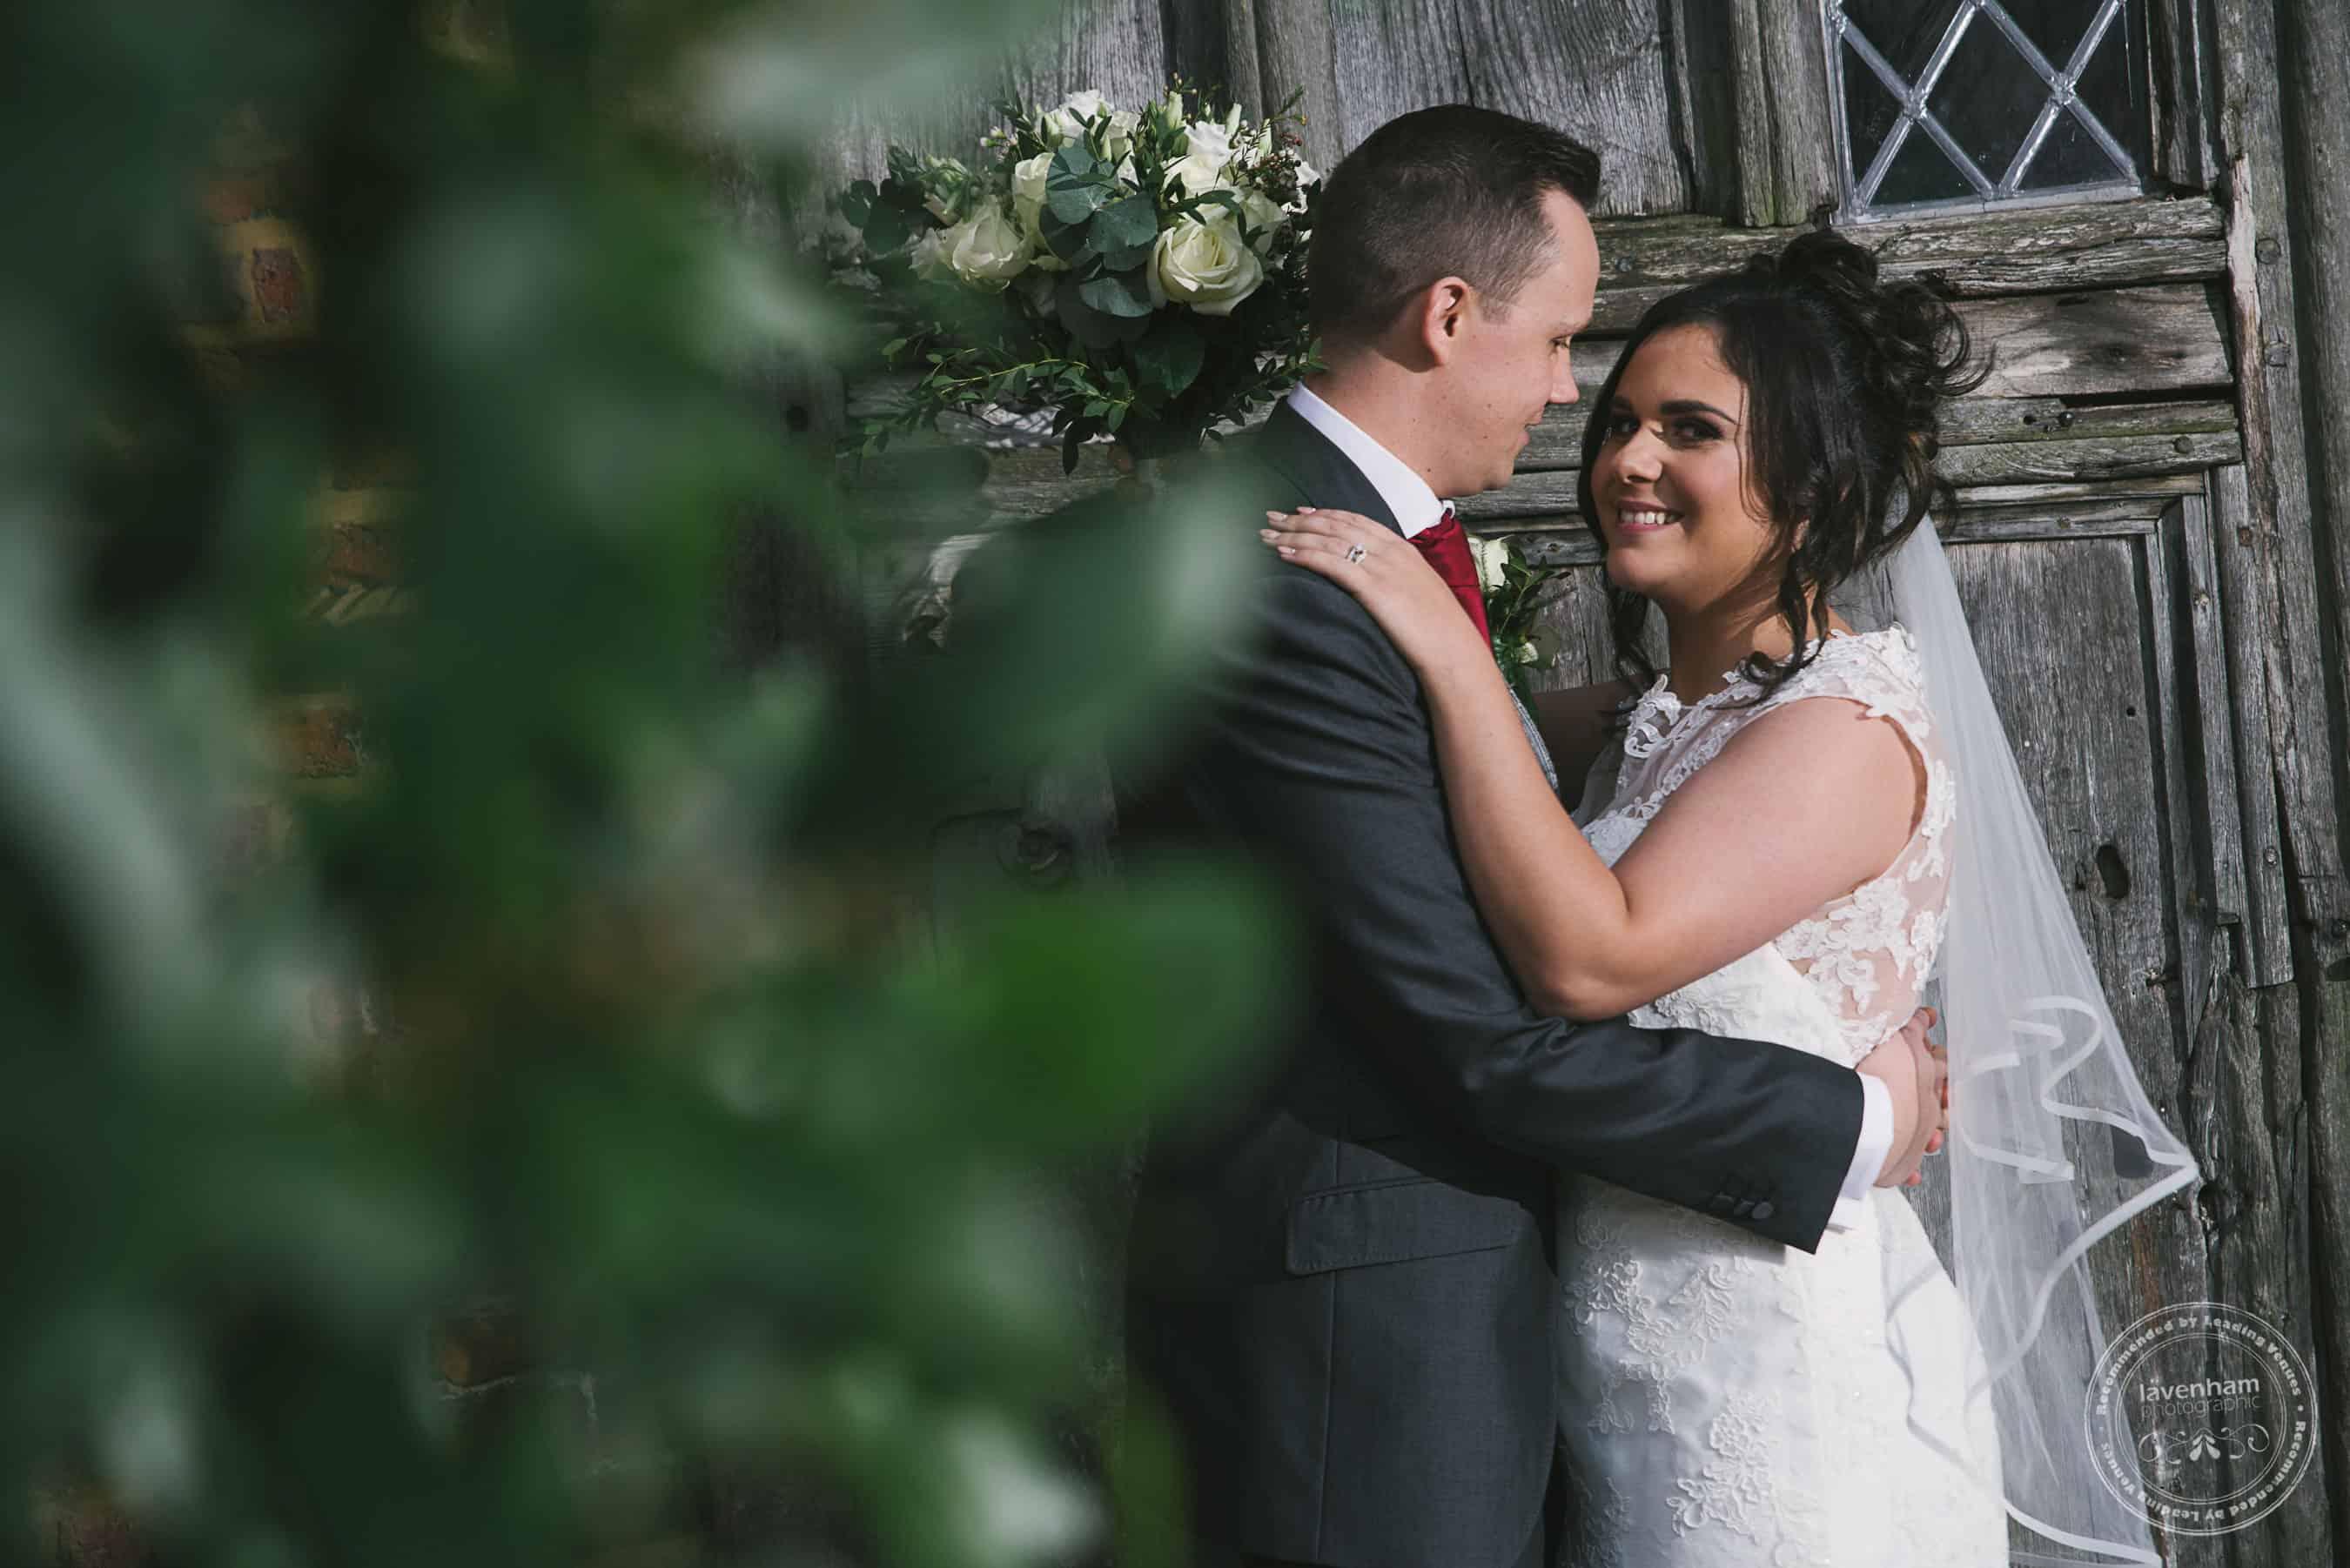 251118 Leez Priory Wedding Photography by Lavenham Photographic 074